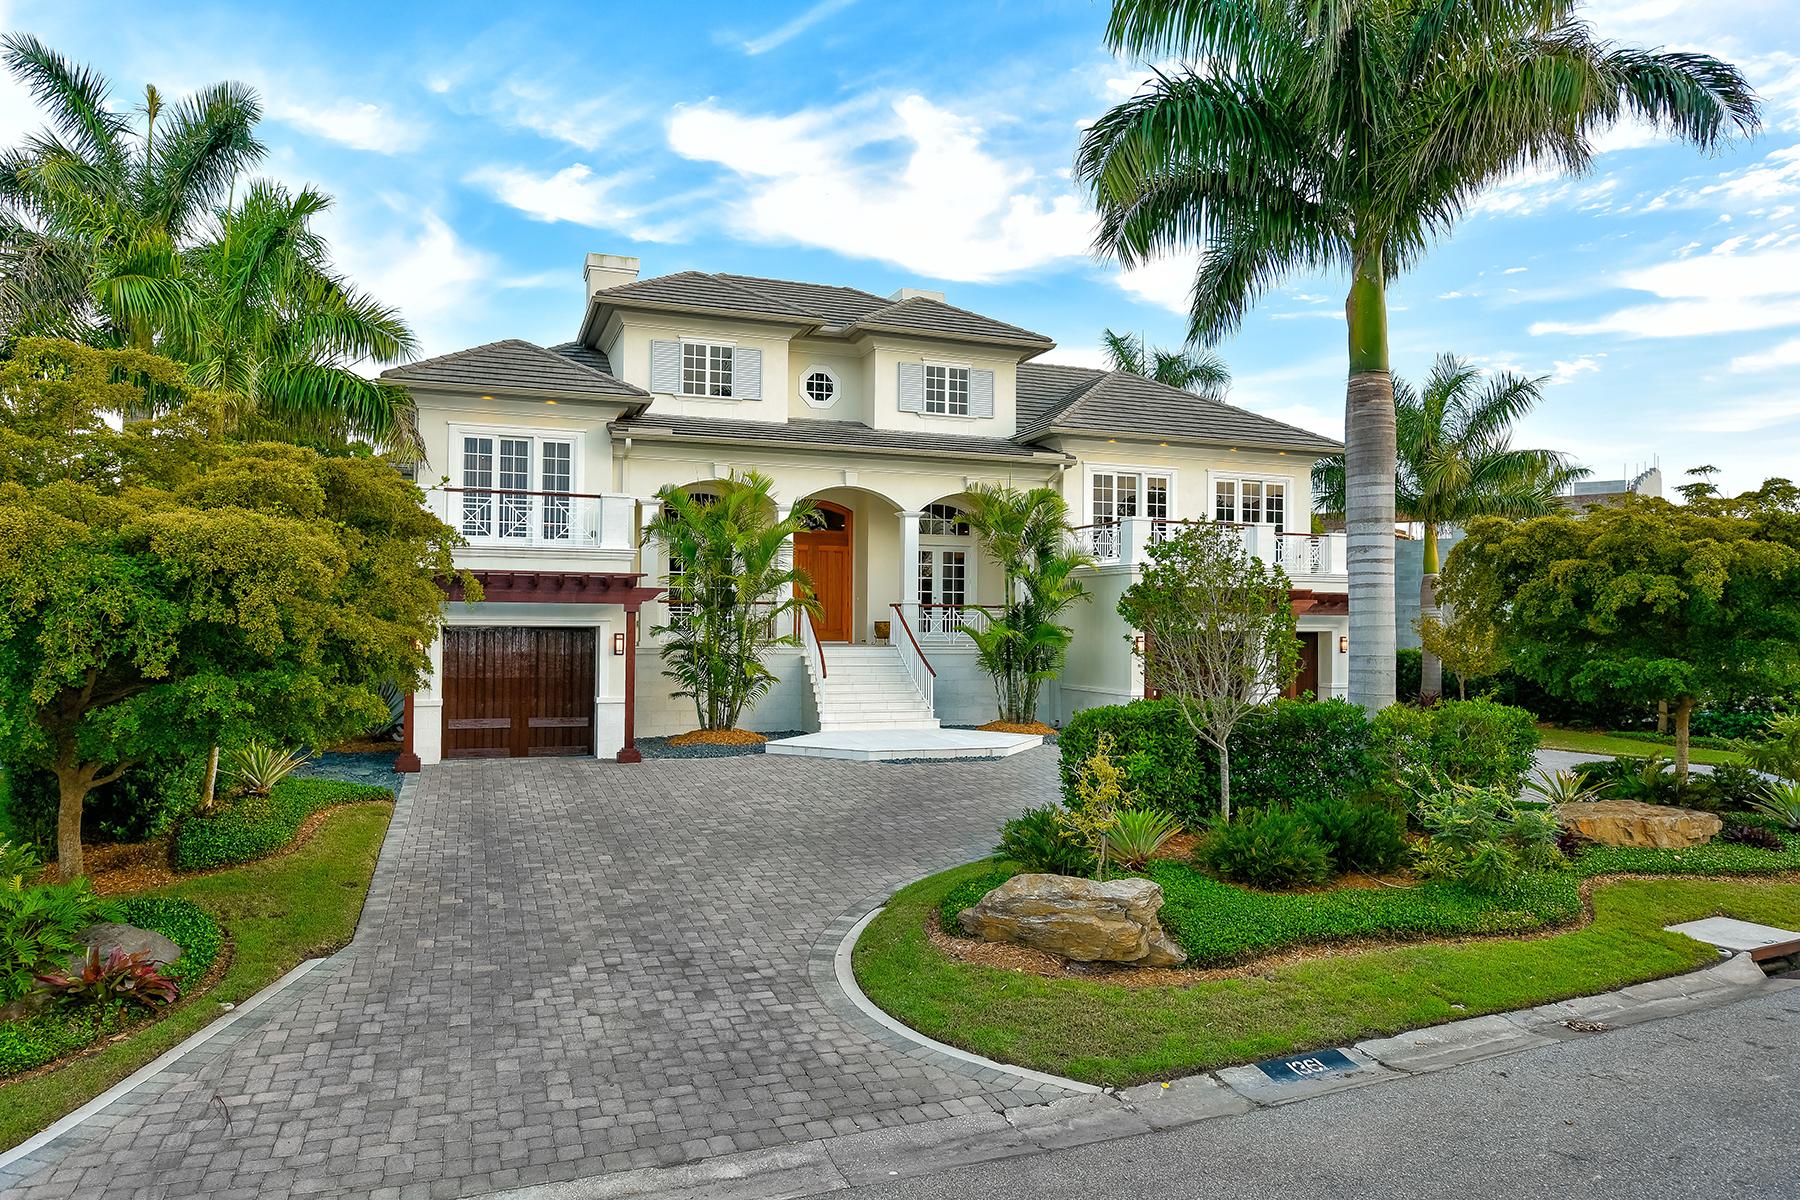 Single Family Homes for Sale at 513 Casey Key Rd, Nokomis, Florida 34275 United States